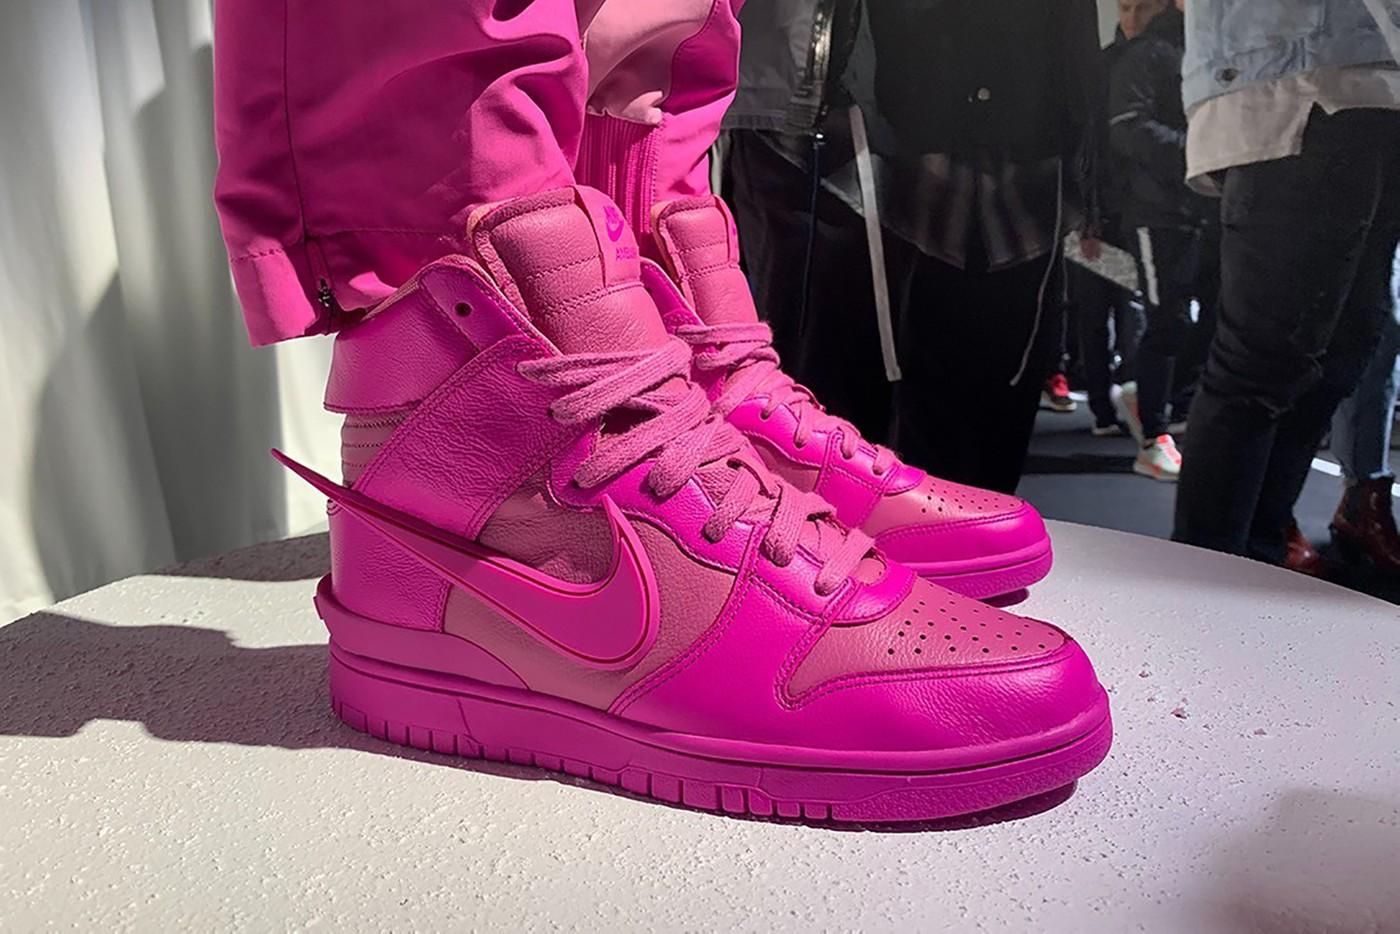 AMBUSH x Nike Dunk High Sneaker Collaboration